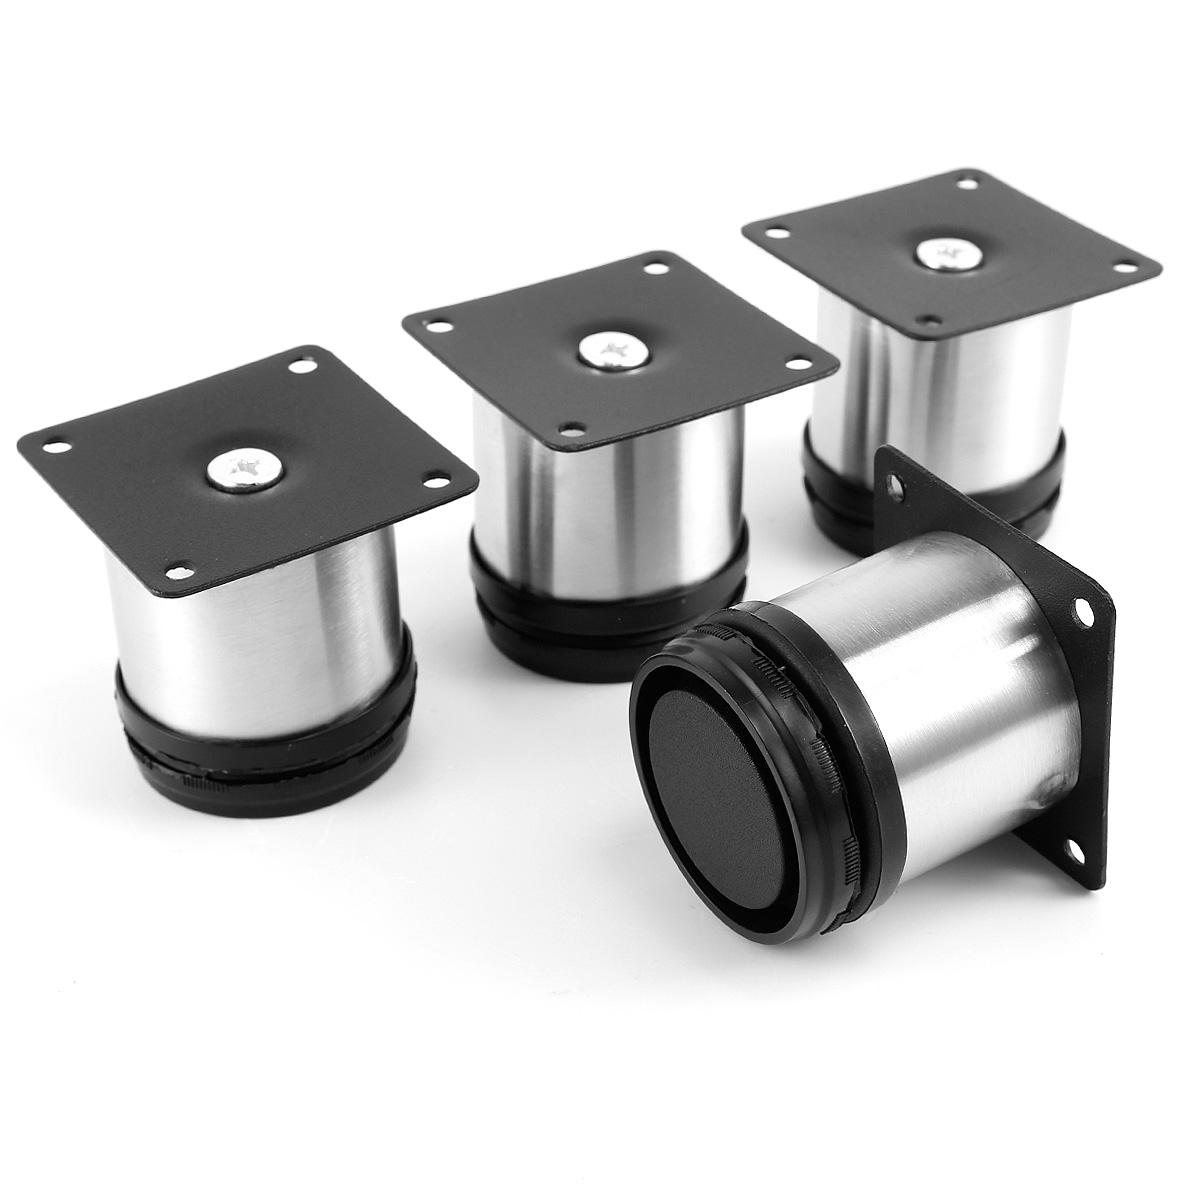 4 Pcs Cabinet Metal Legs Adjustable Stainless Steel